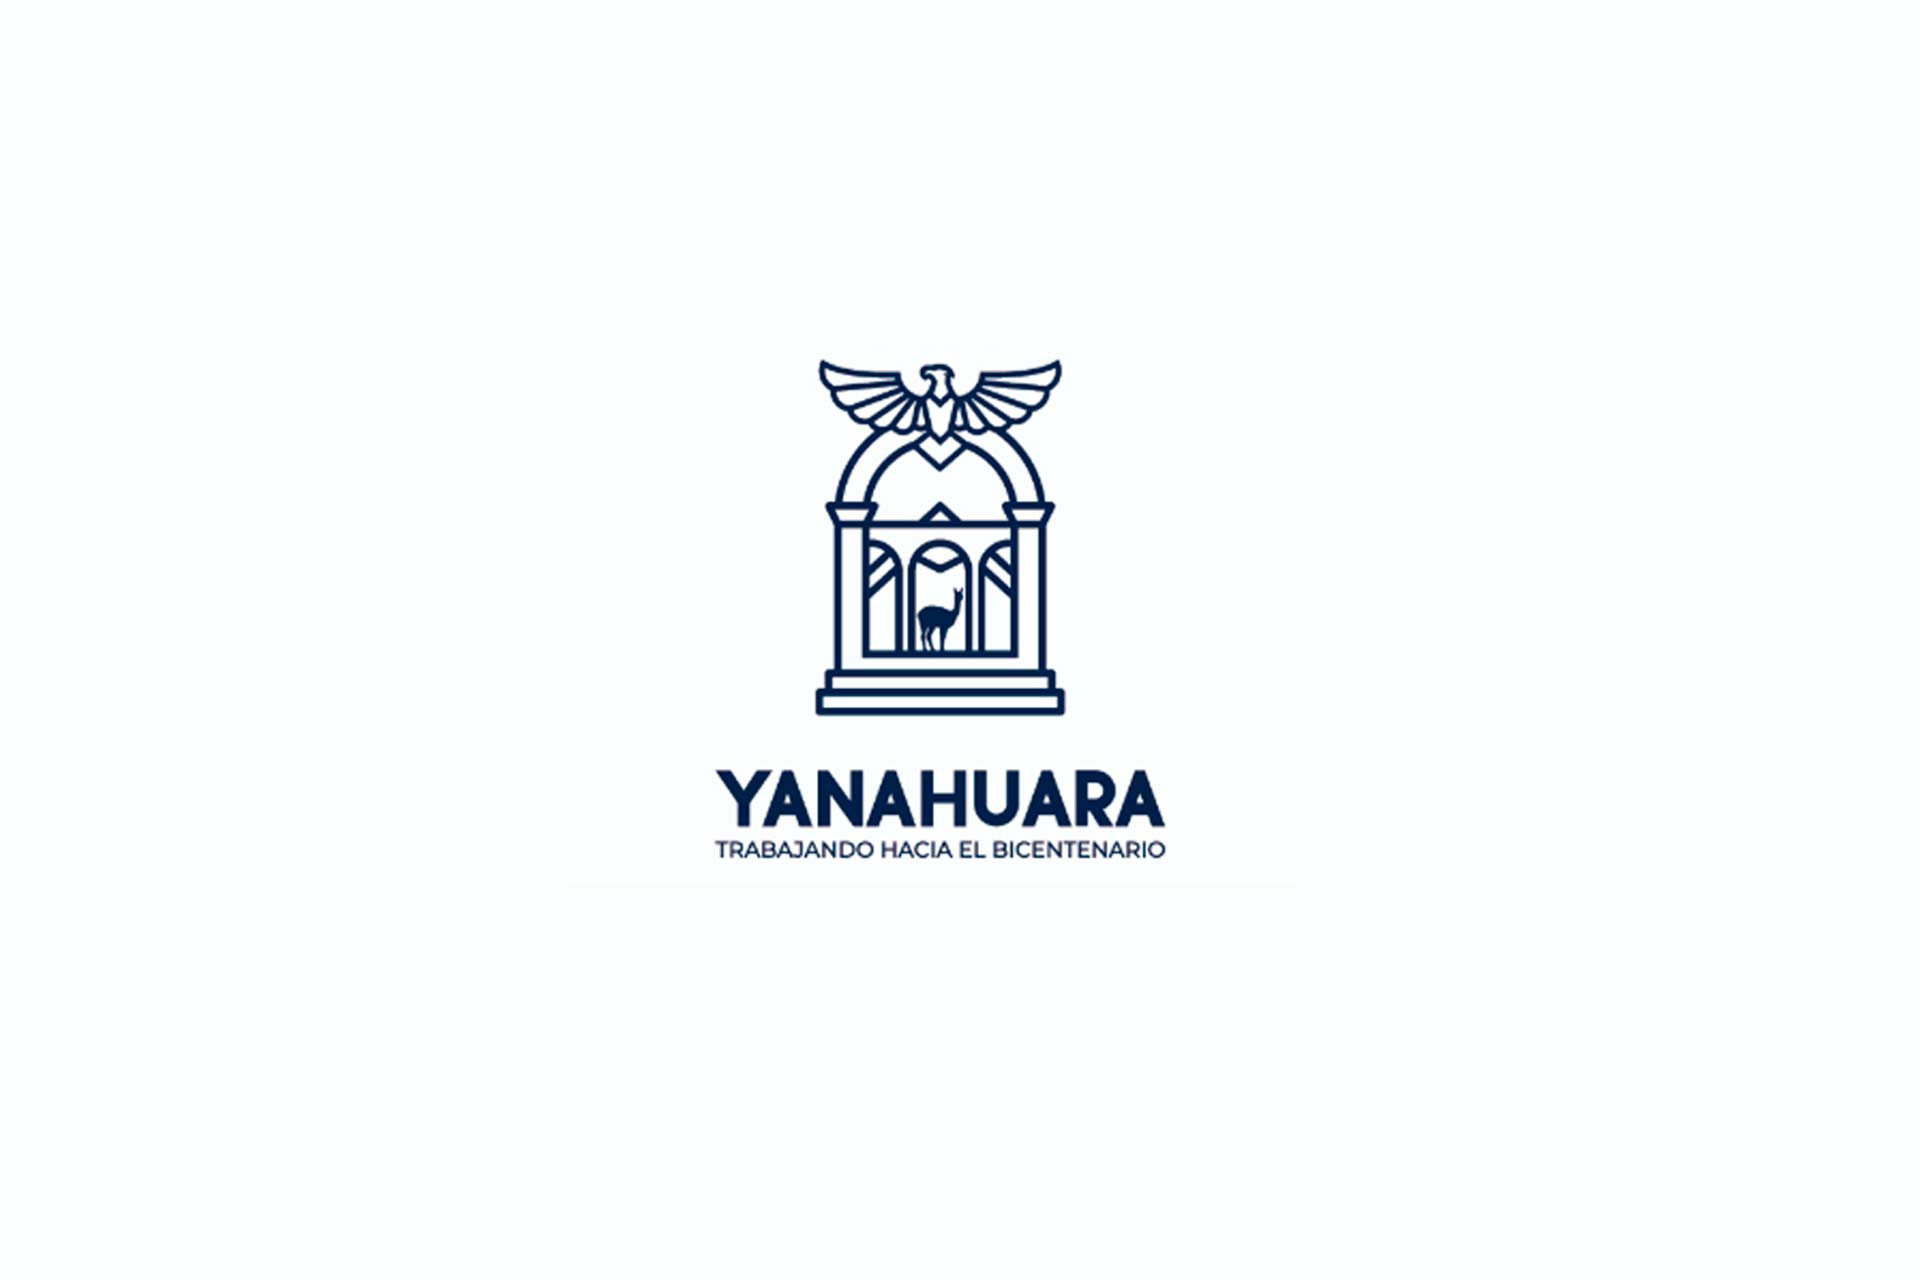 inmobiliarias en yanahuara